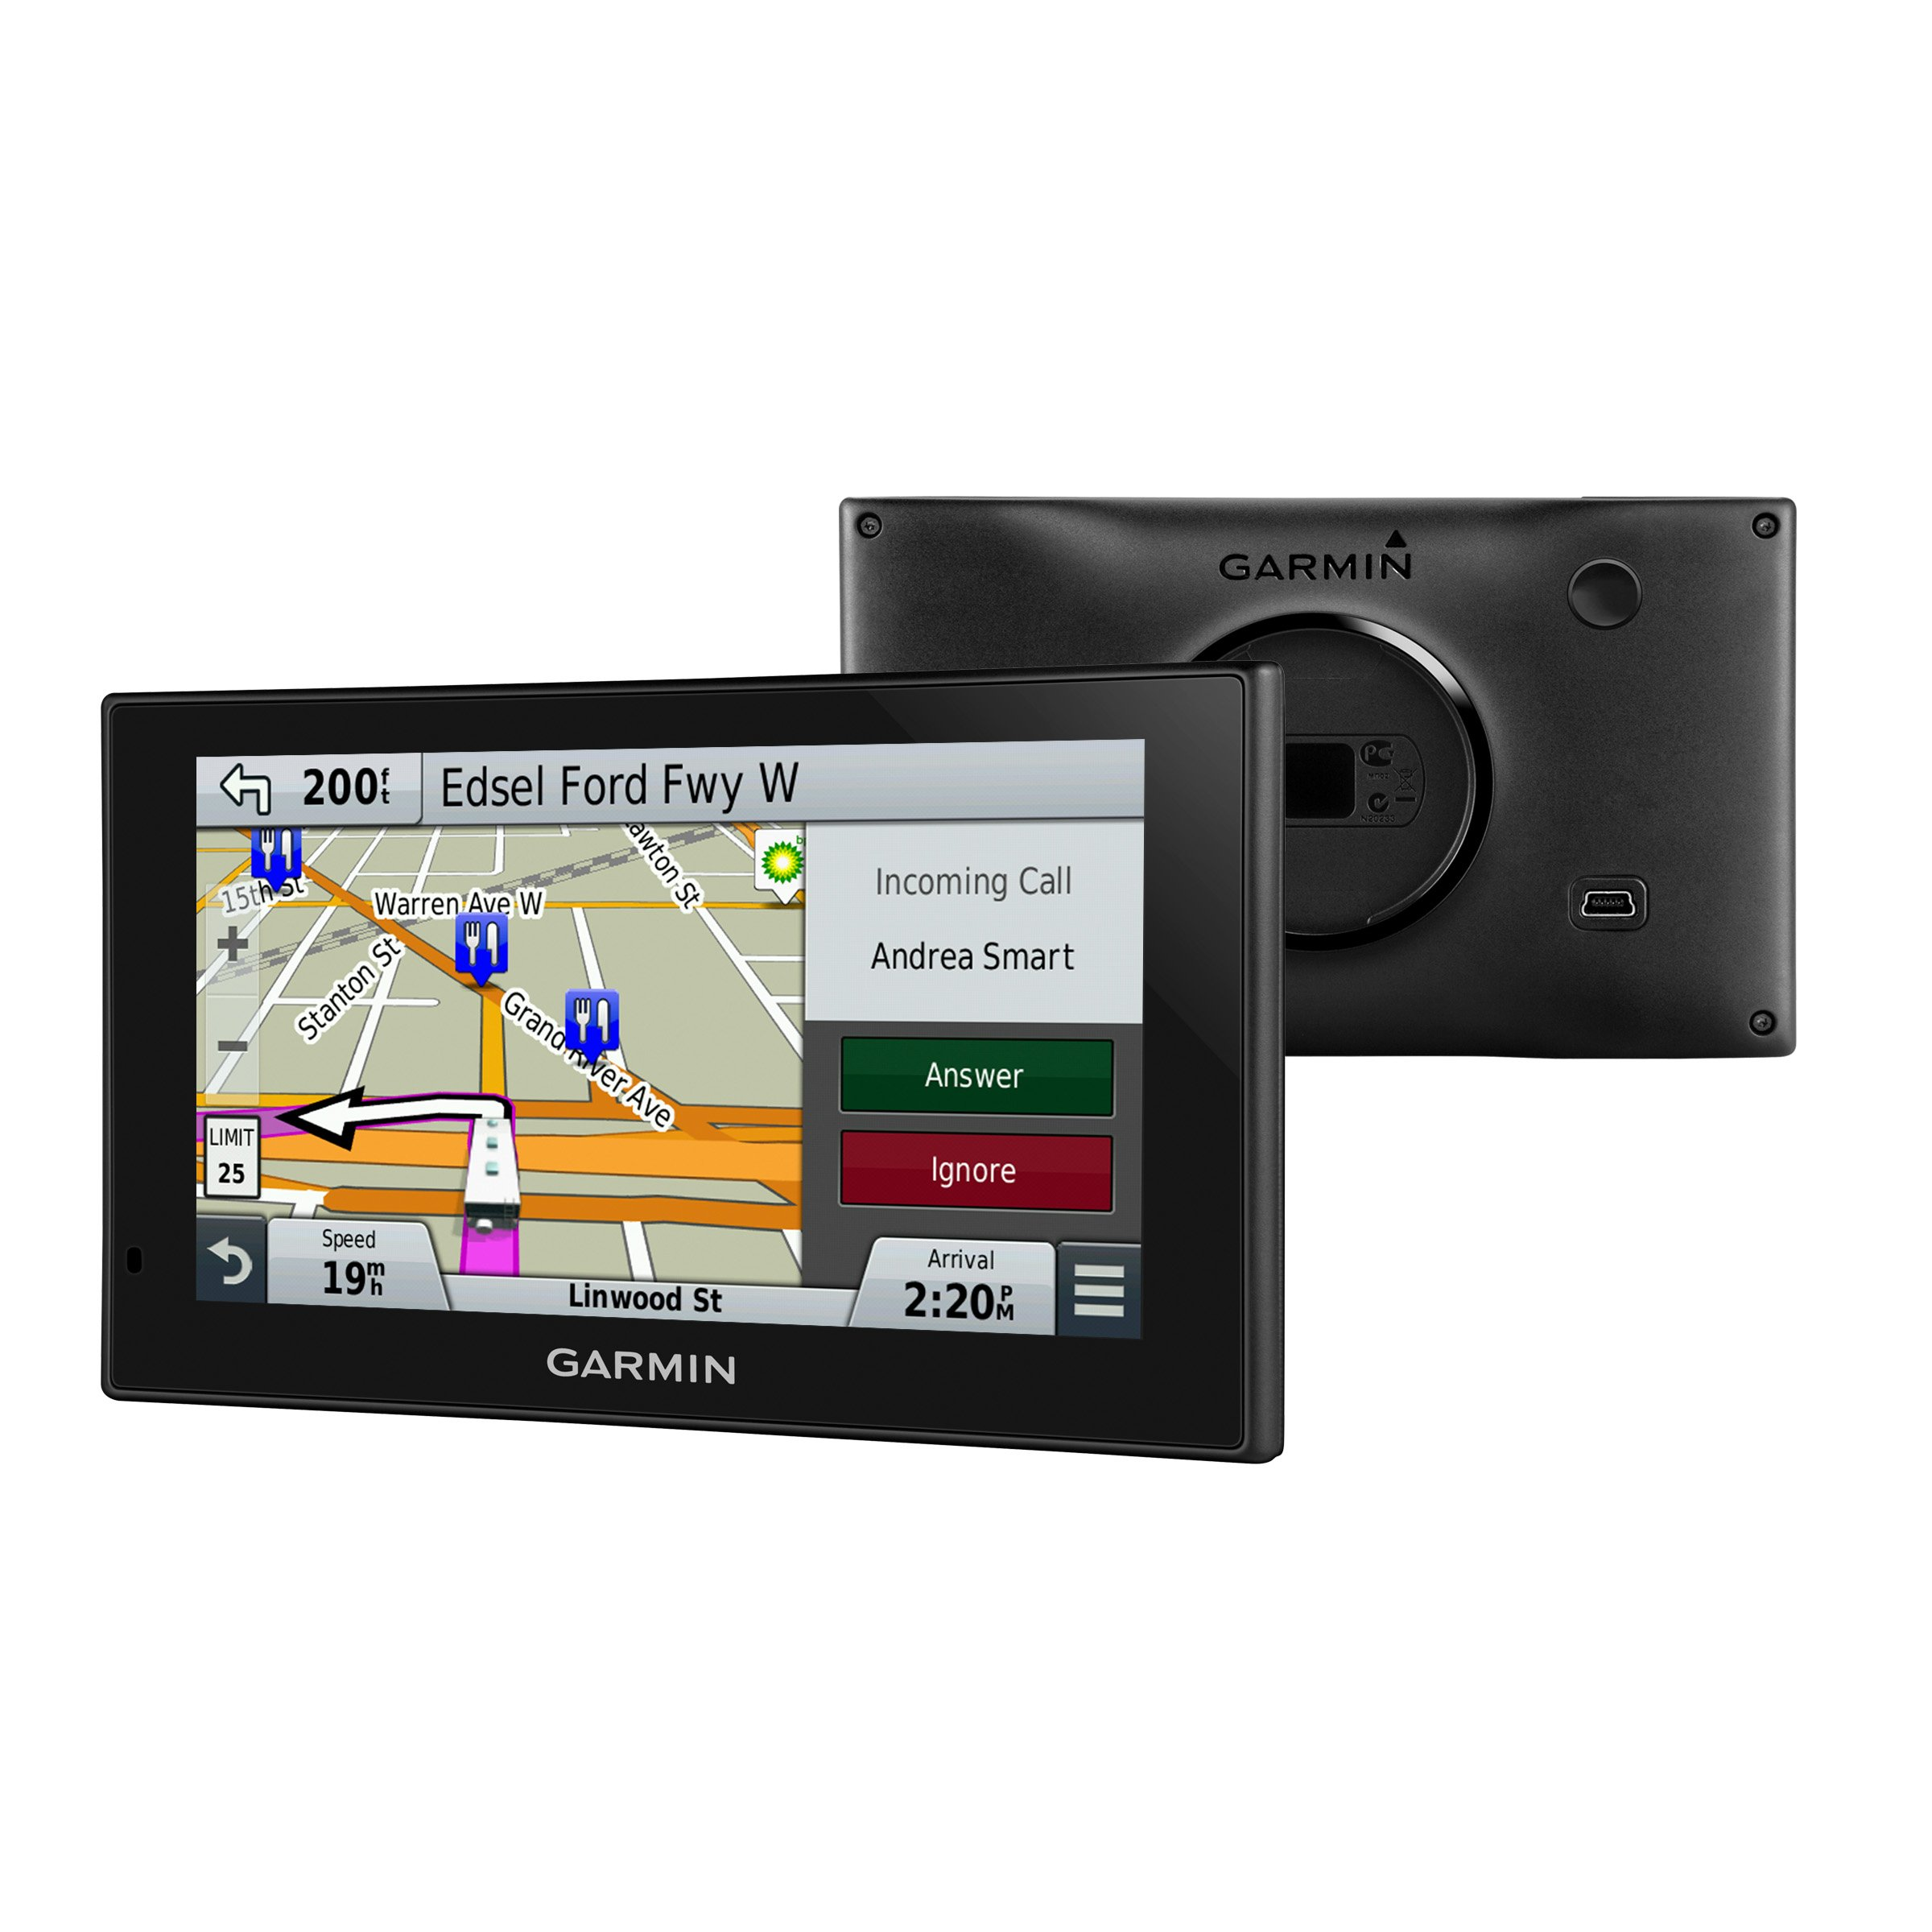 Garmin 660lmt Automobile Portable Gps Navigator - Portabl...